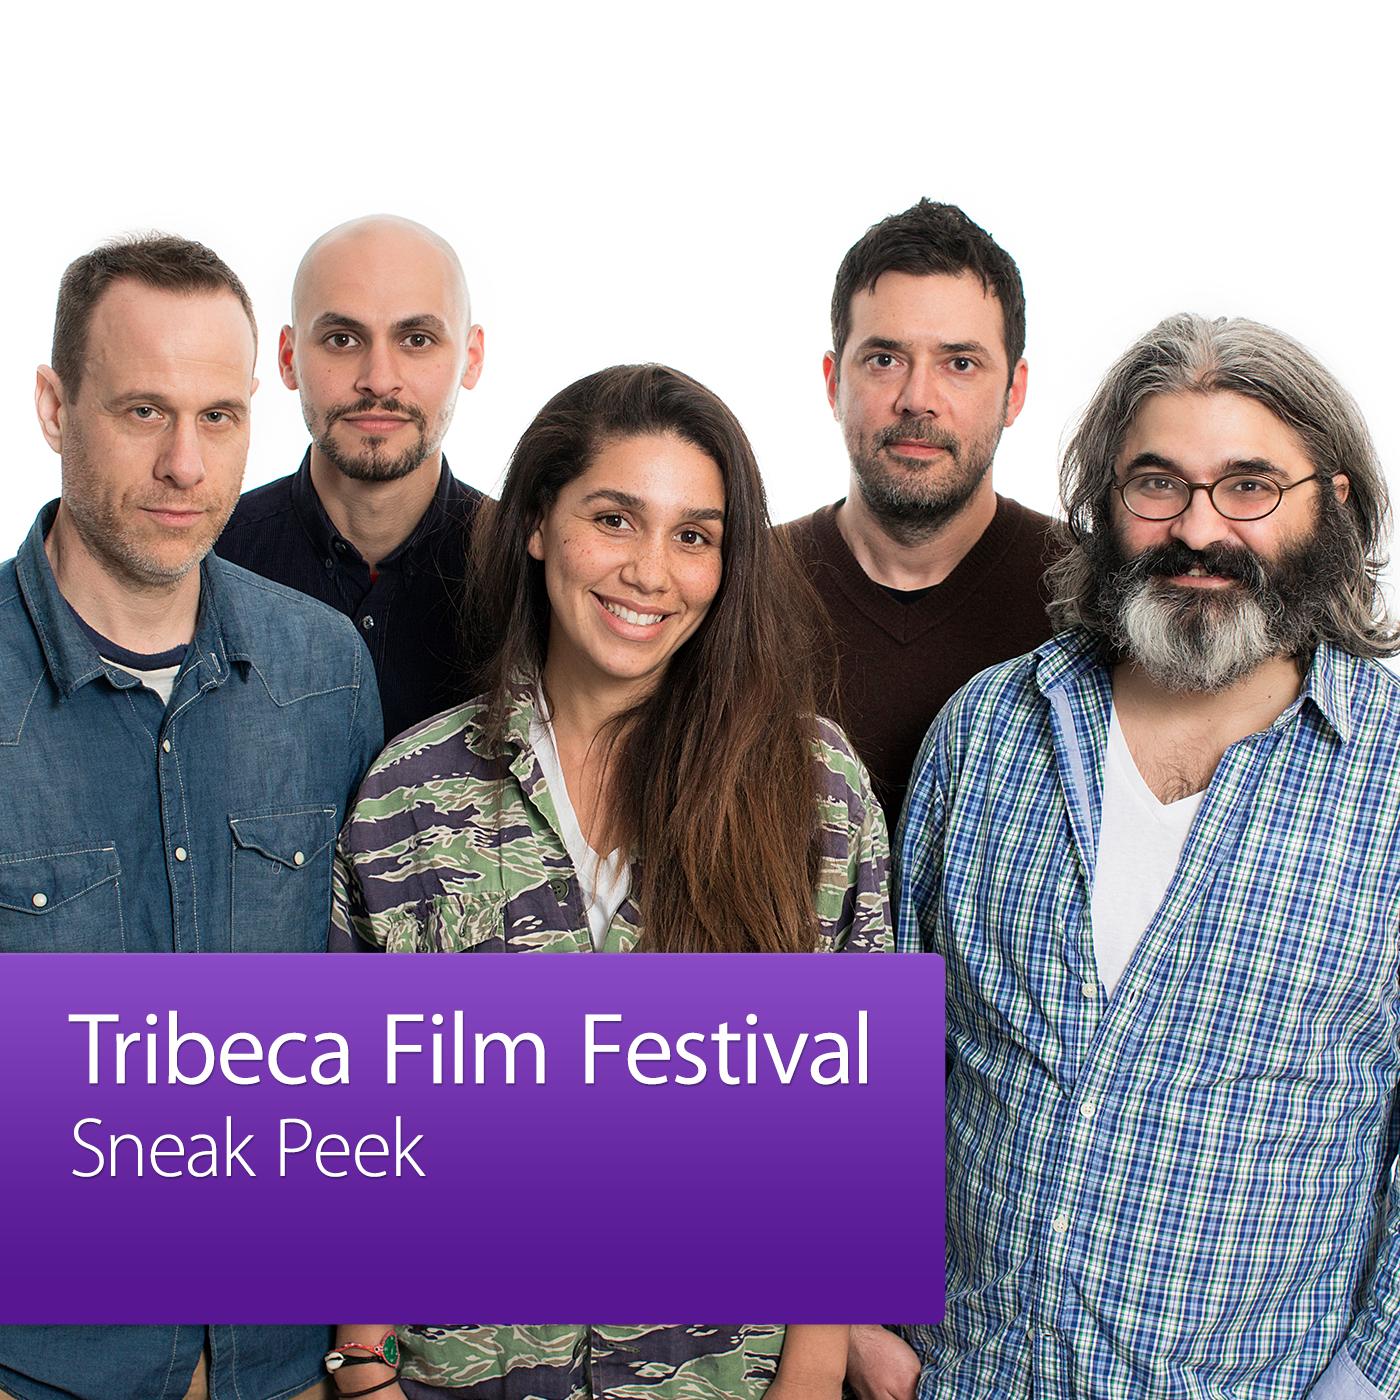 Tribeca Film Festival Sneak Peek